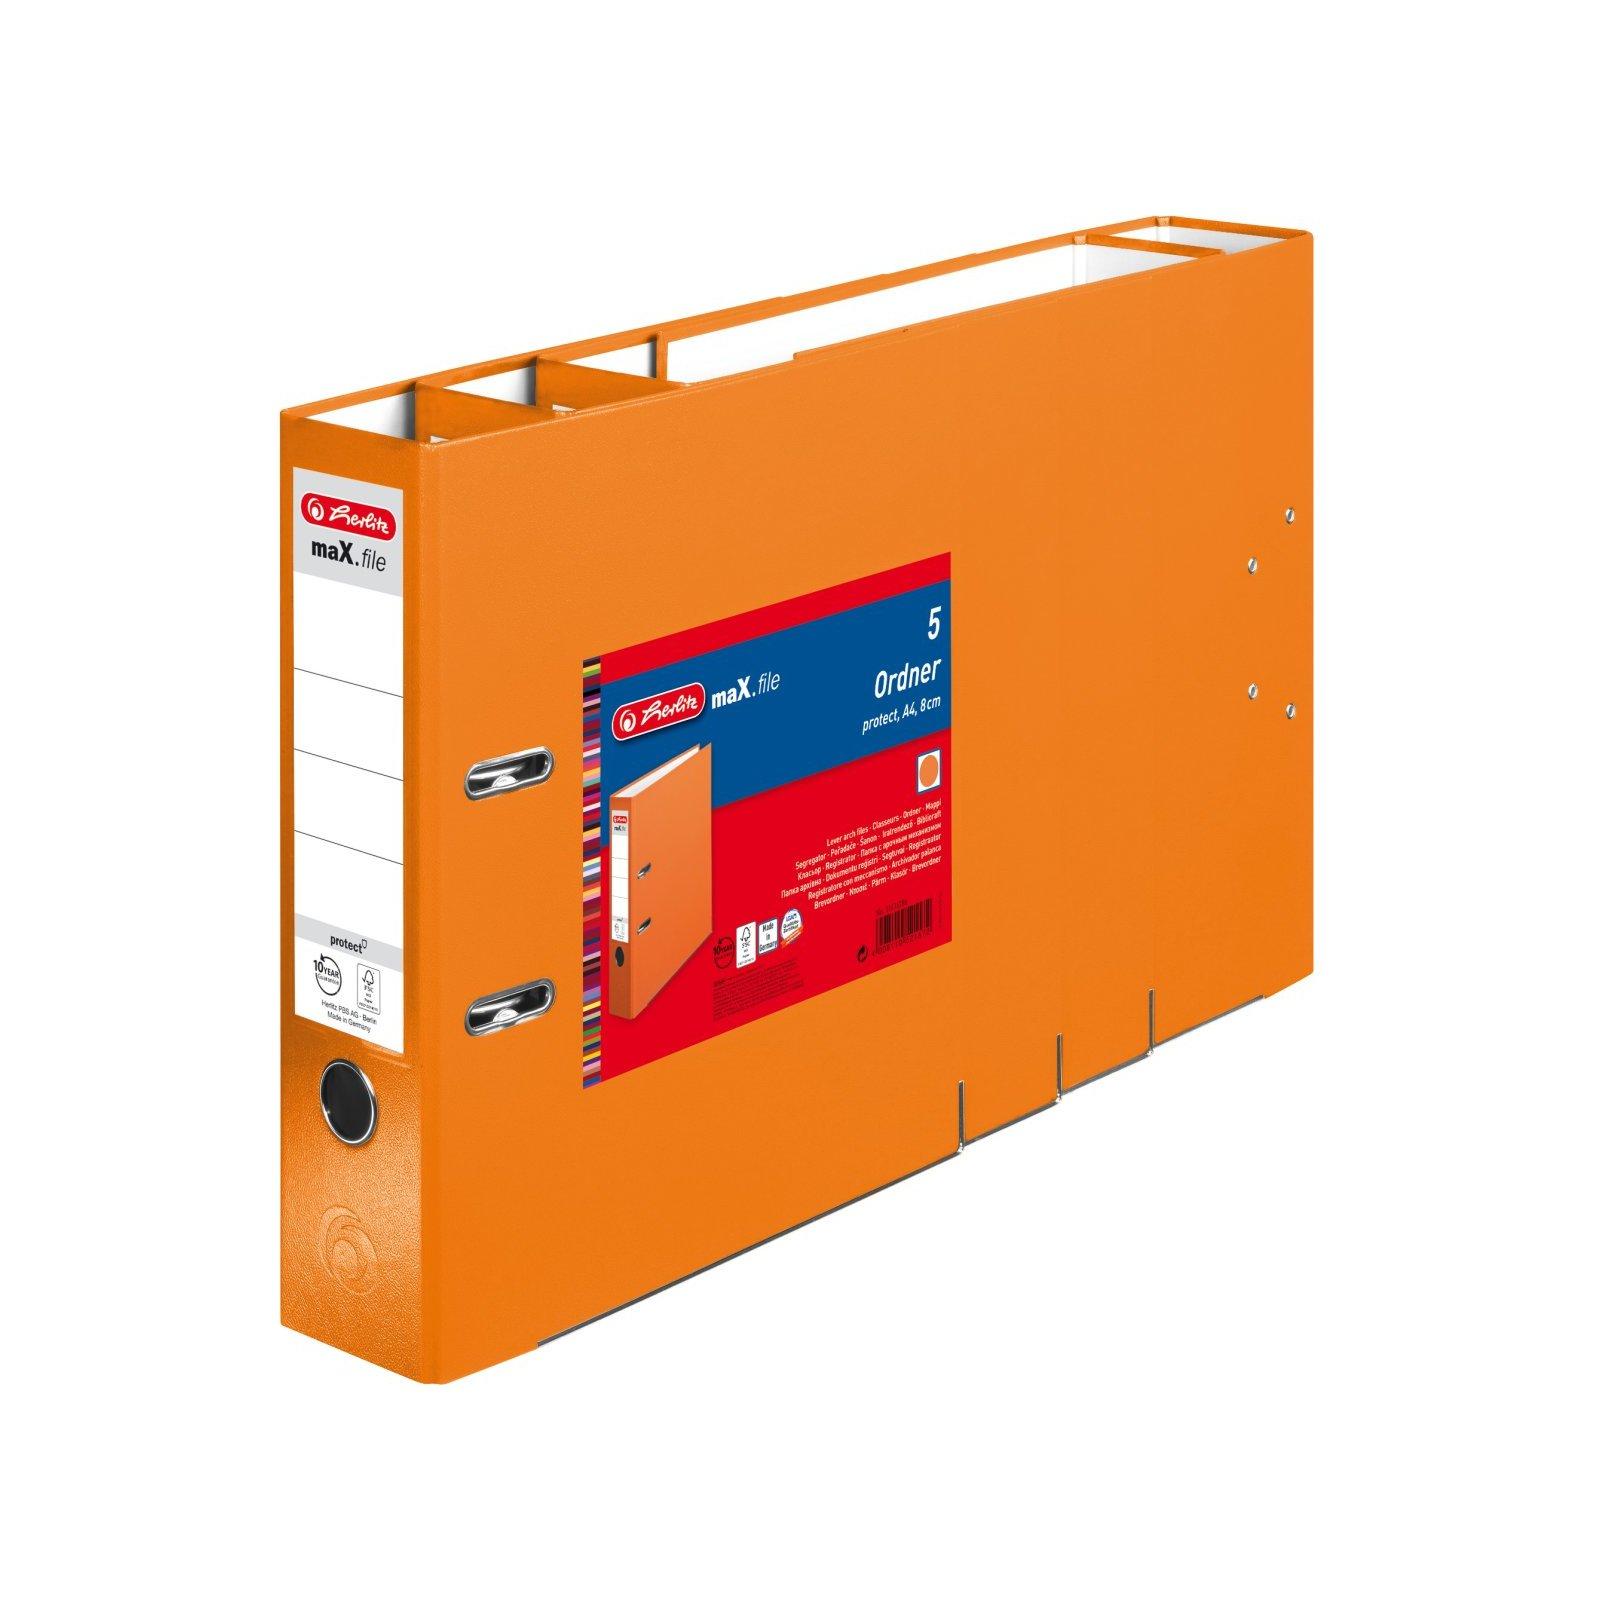 80 mm herlitz Ordner maX.file protect A4 orange